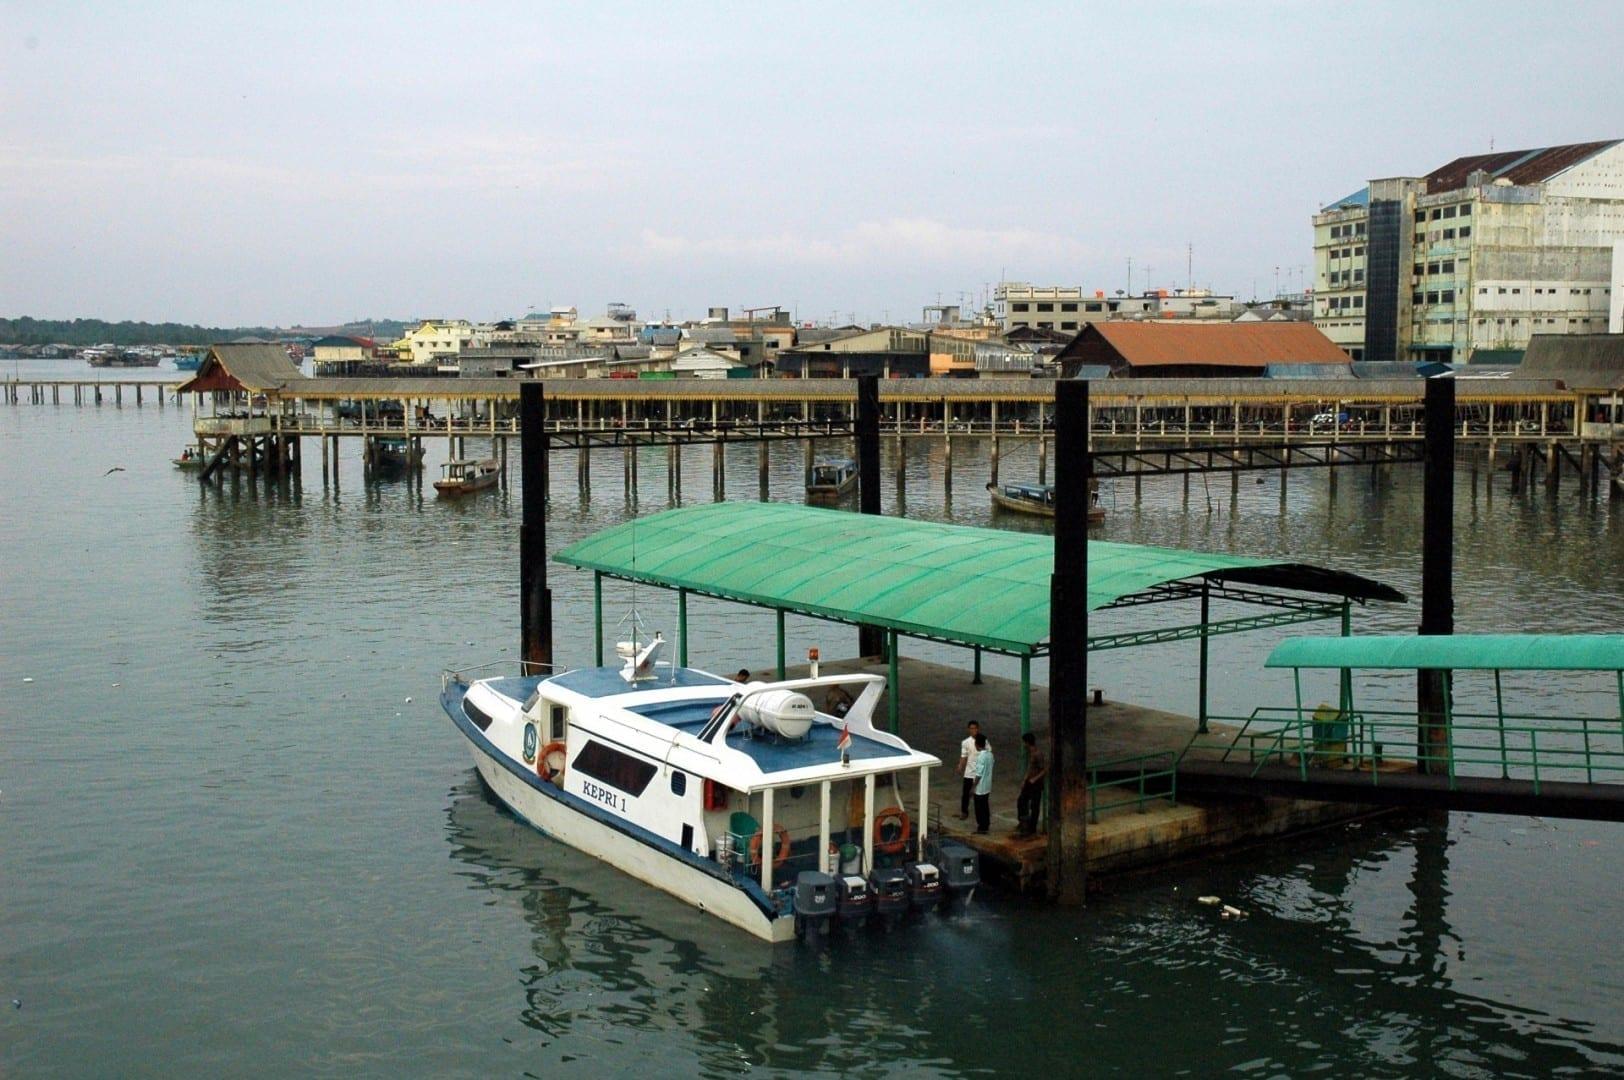 Vista de Tanjung Pinang desde la terminal del ferry Tanjung Pinang Indonesia